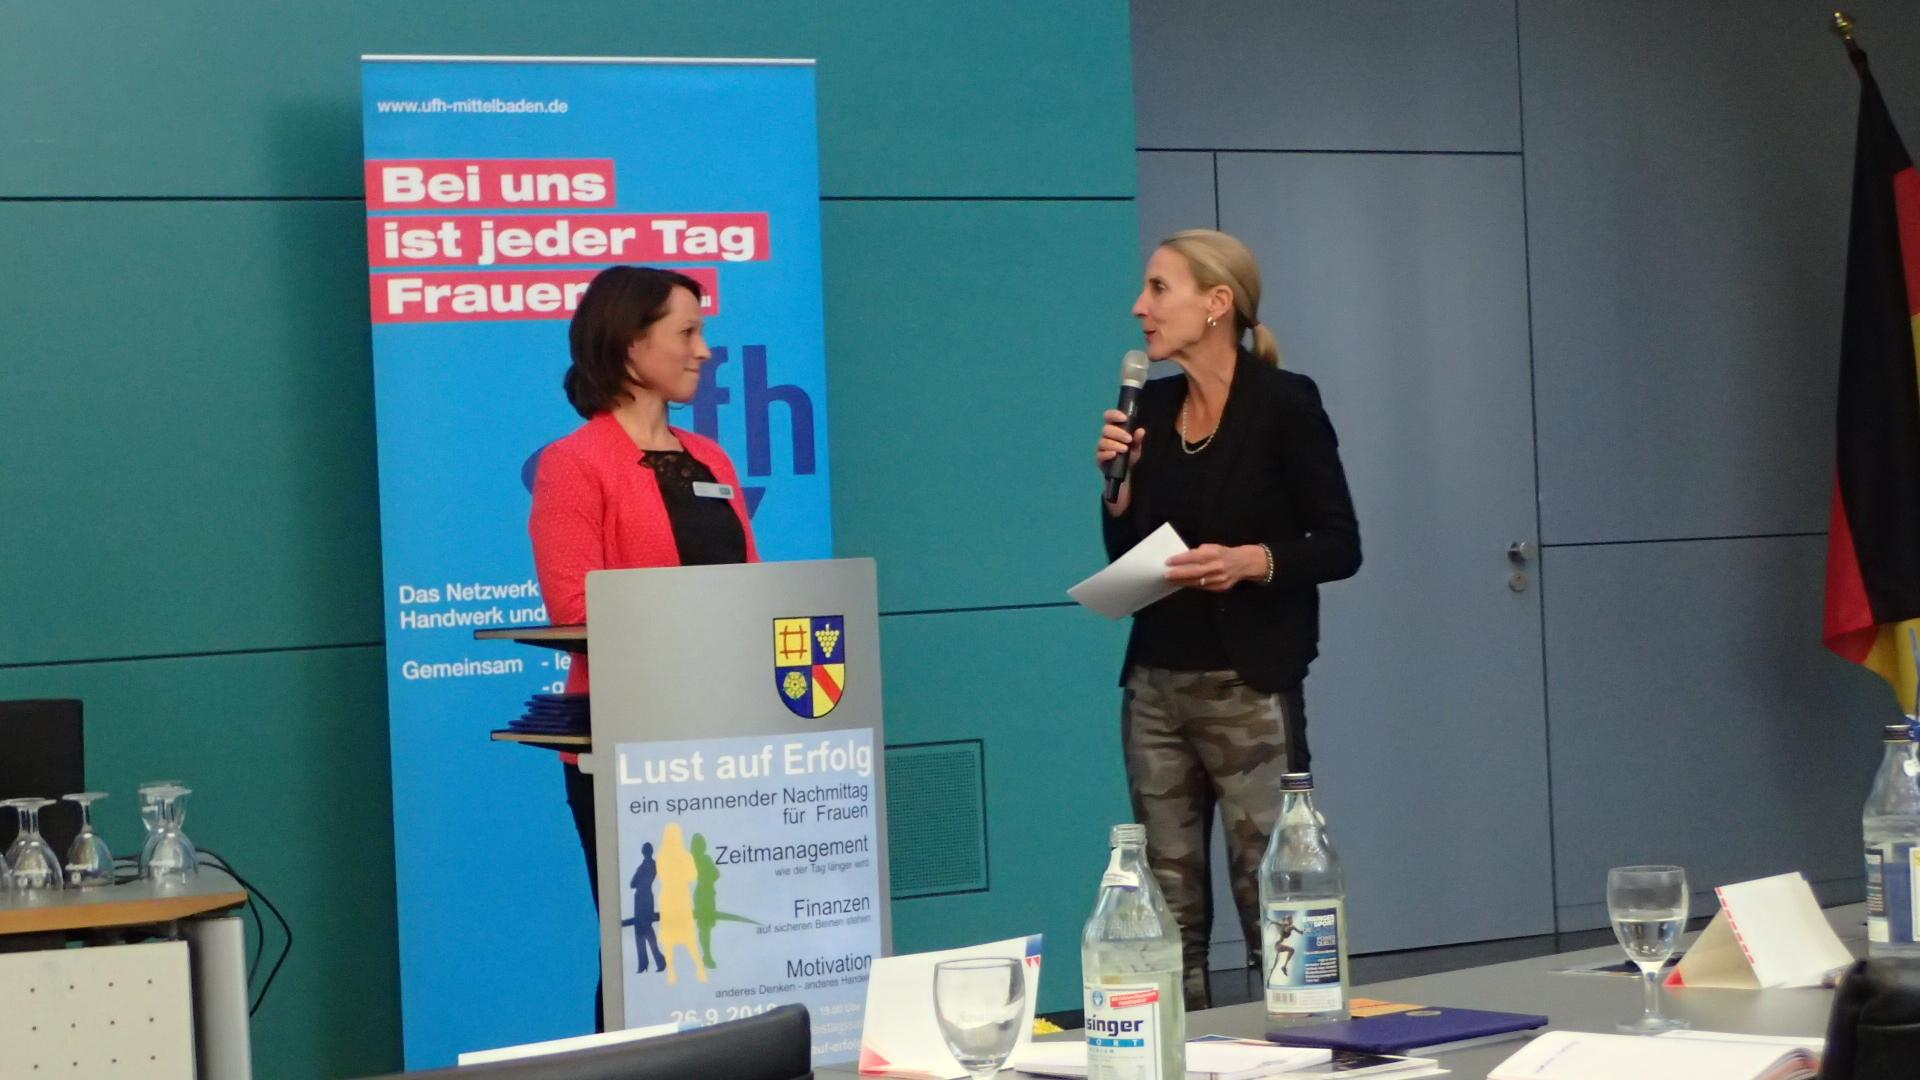 09-18 Referentin Christine Lauinger, Moderation Brigitta Lenhard